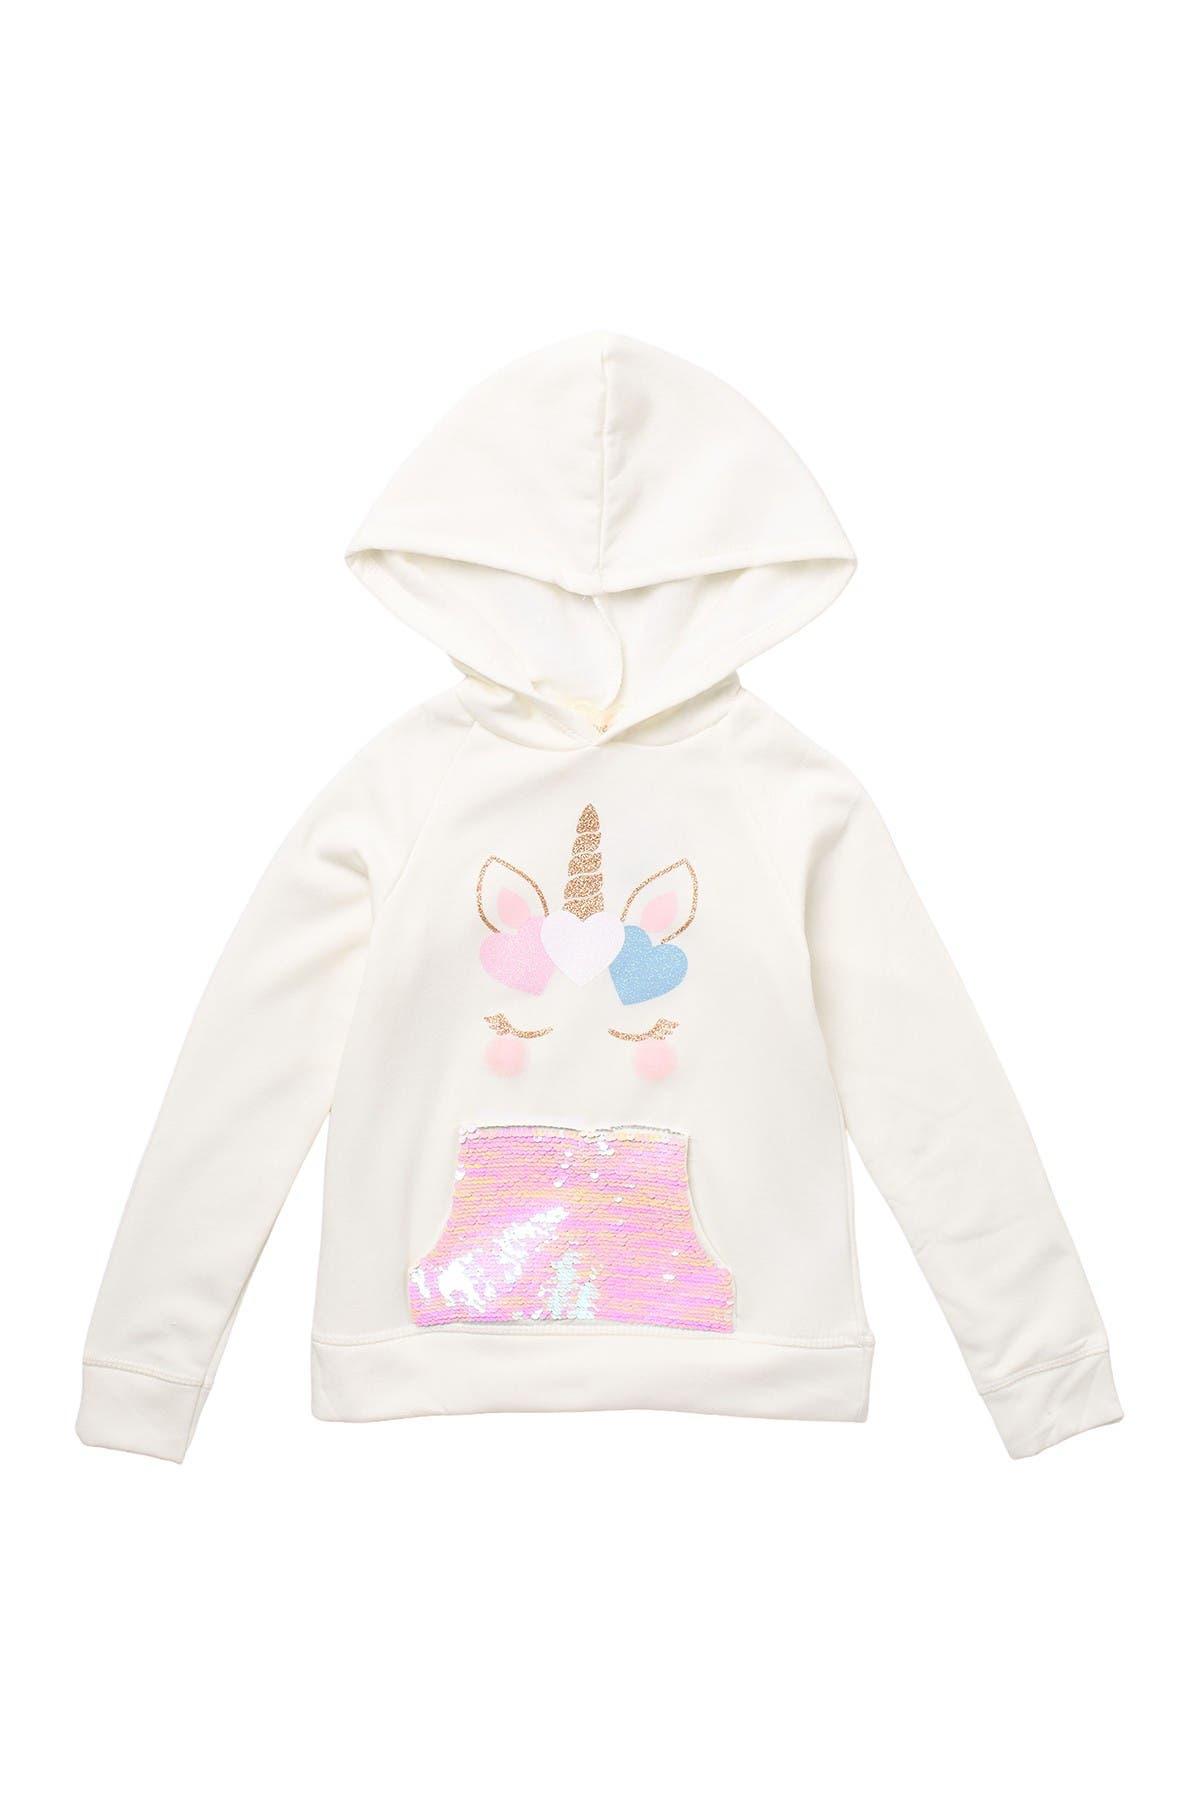 Image of Btween Sequined Unicorn Print Hoodie